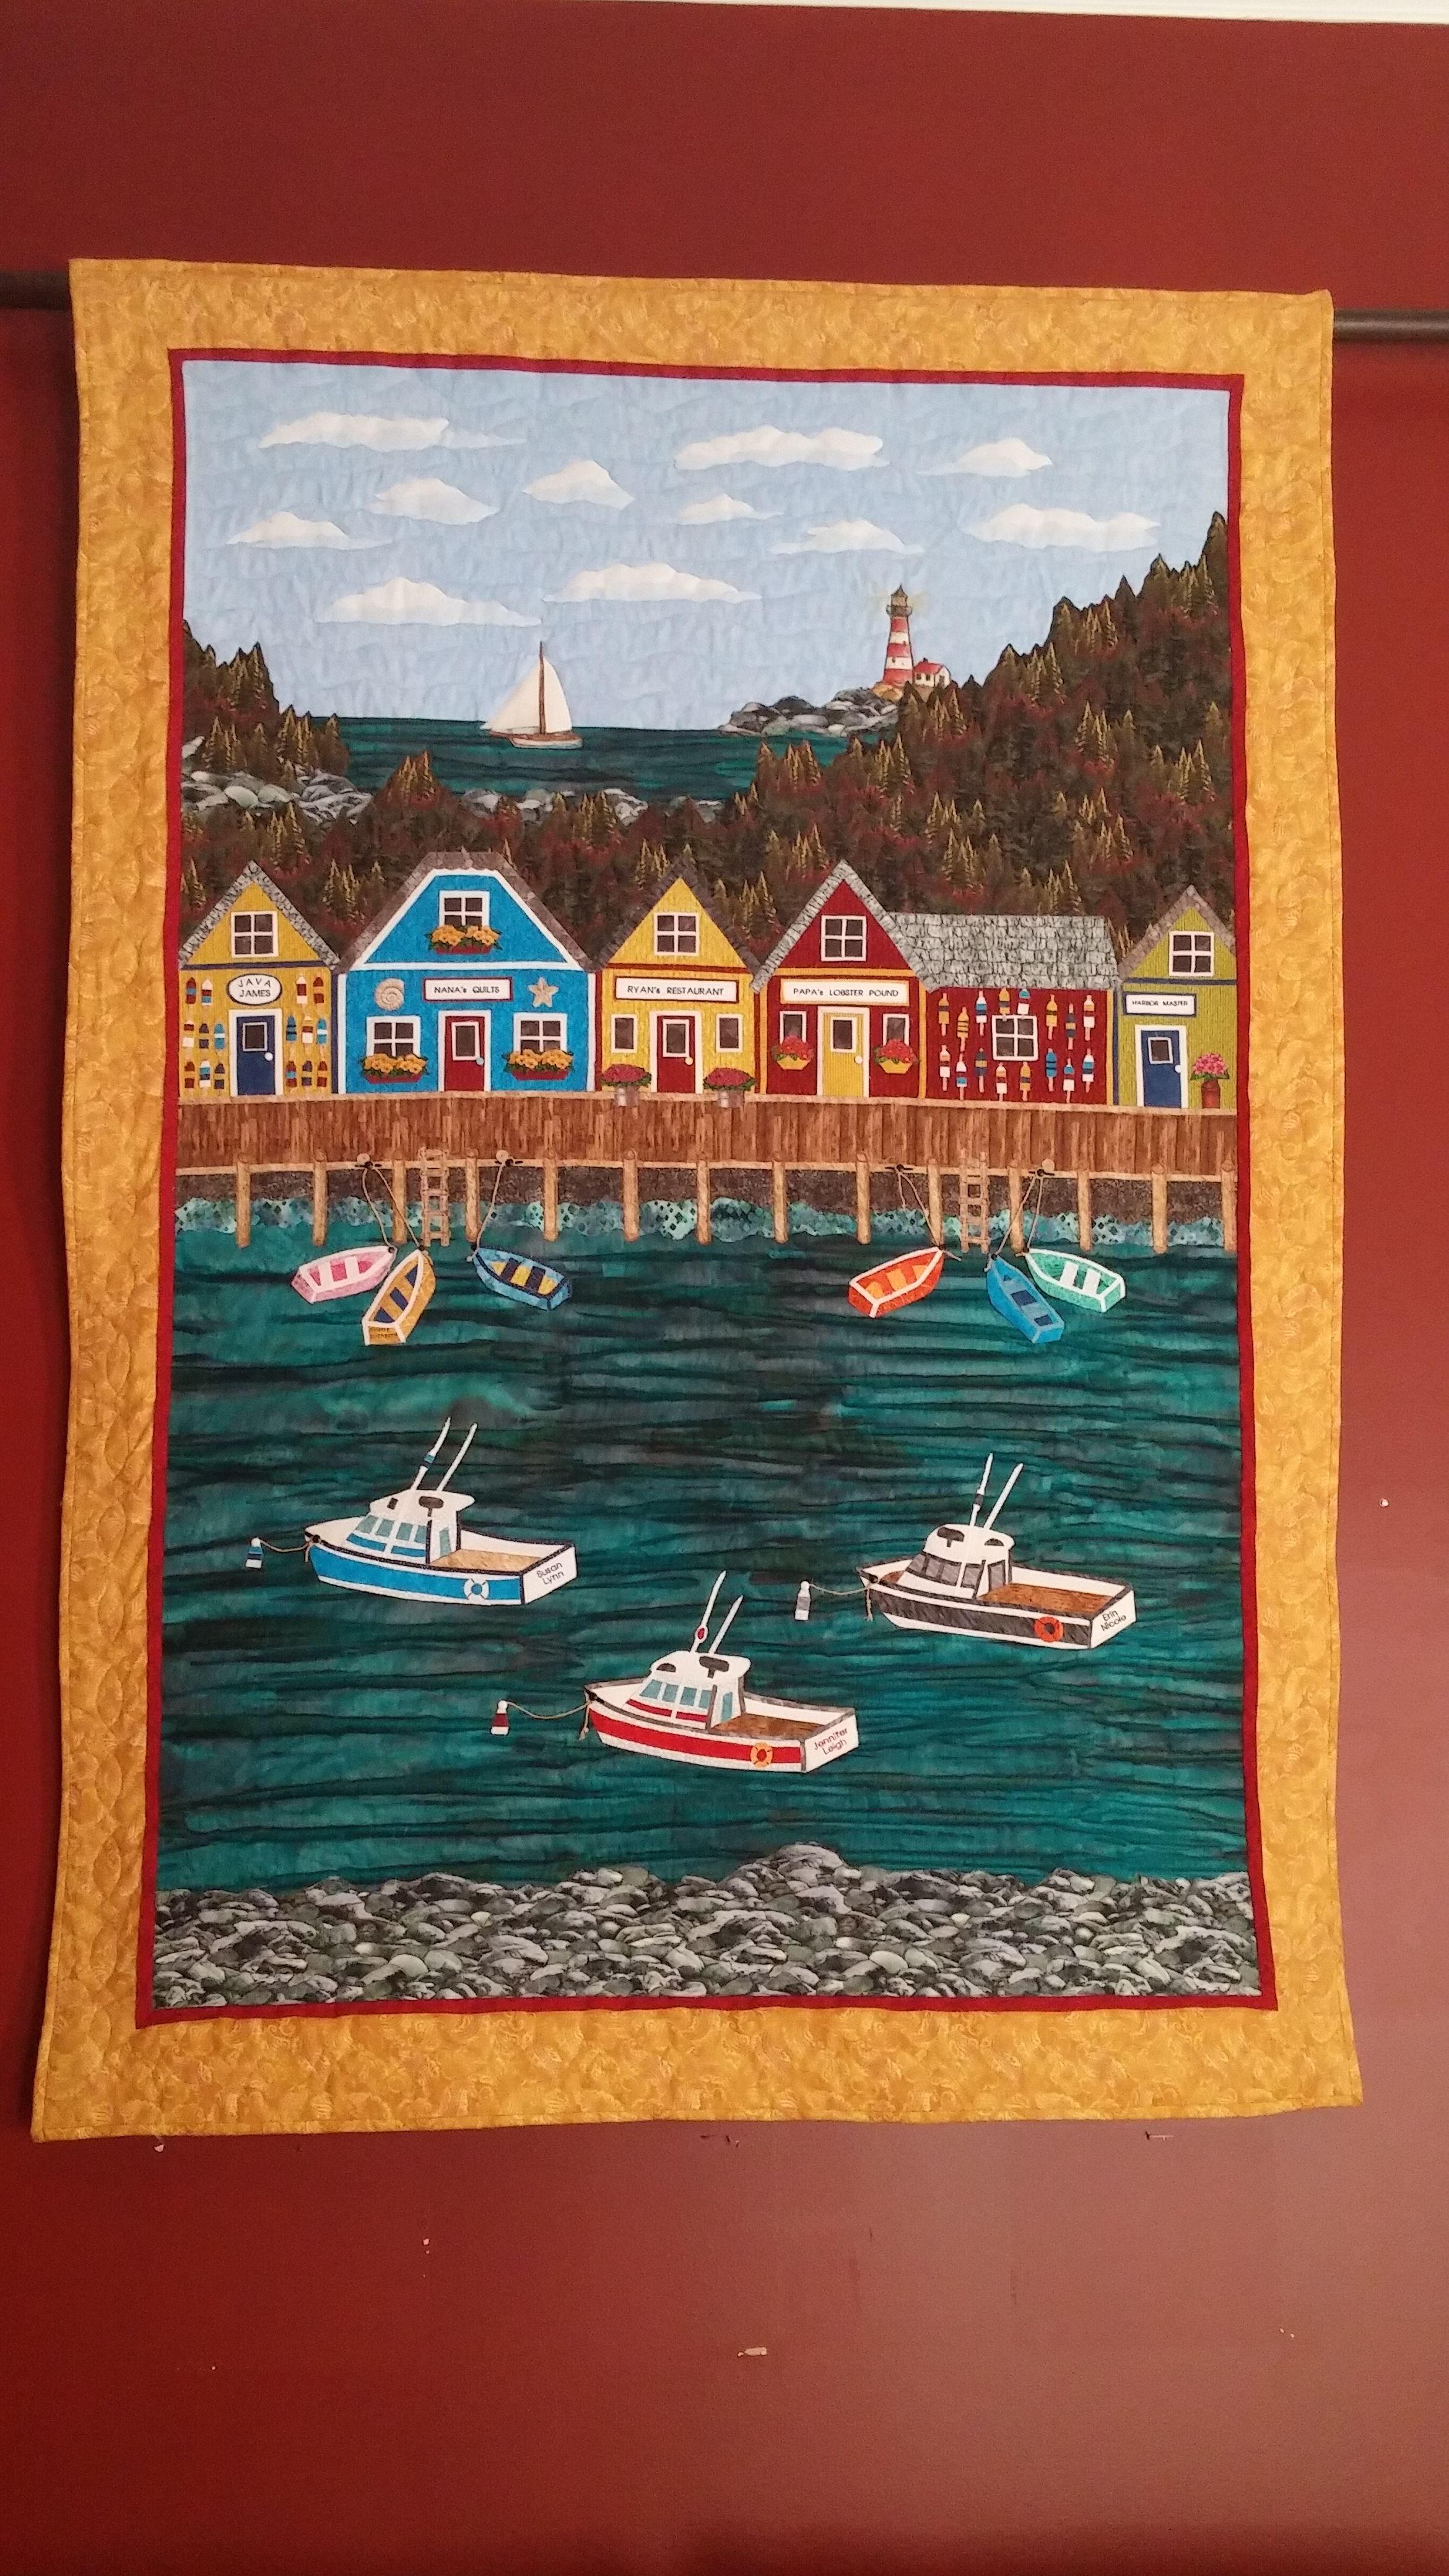 Maine harbor scene landscape quilt.  Boats, Water, Shops, Lighthouse